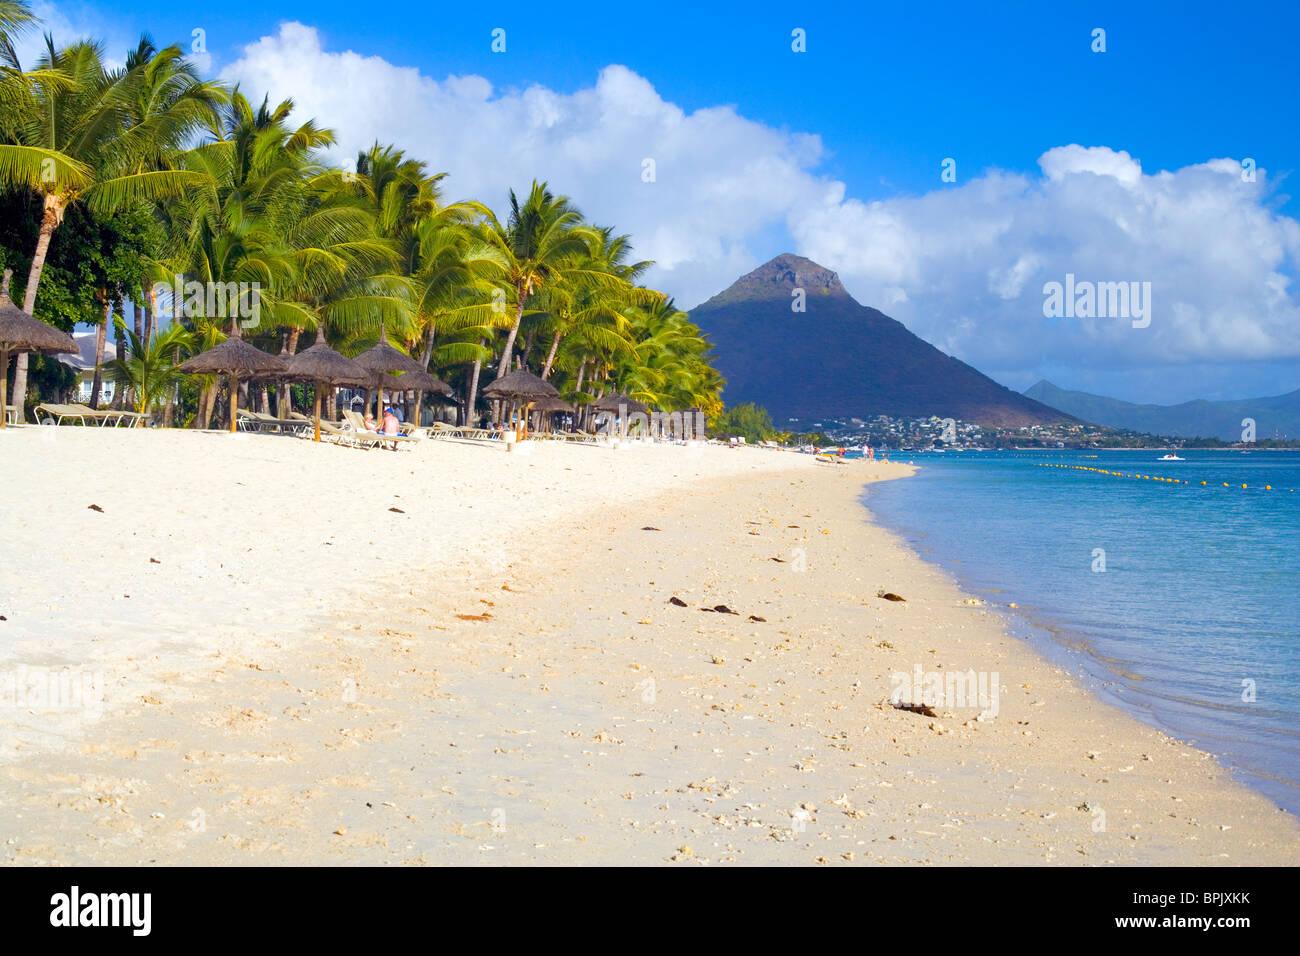 Beach at La Pirogue Hotel, Flic en Flac, Mauritius Stock Photo